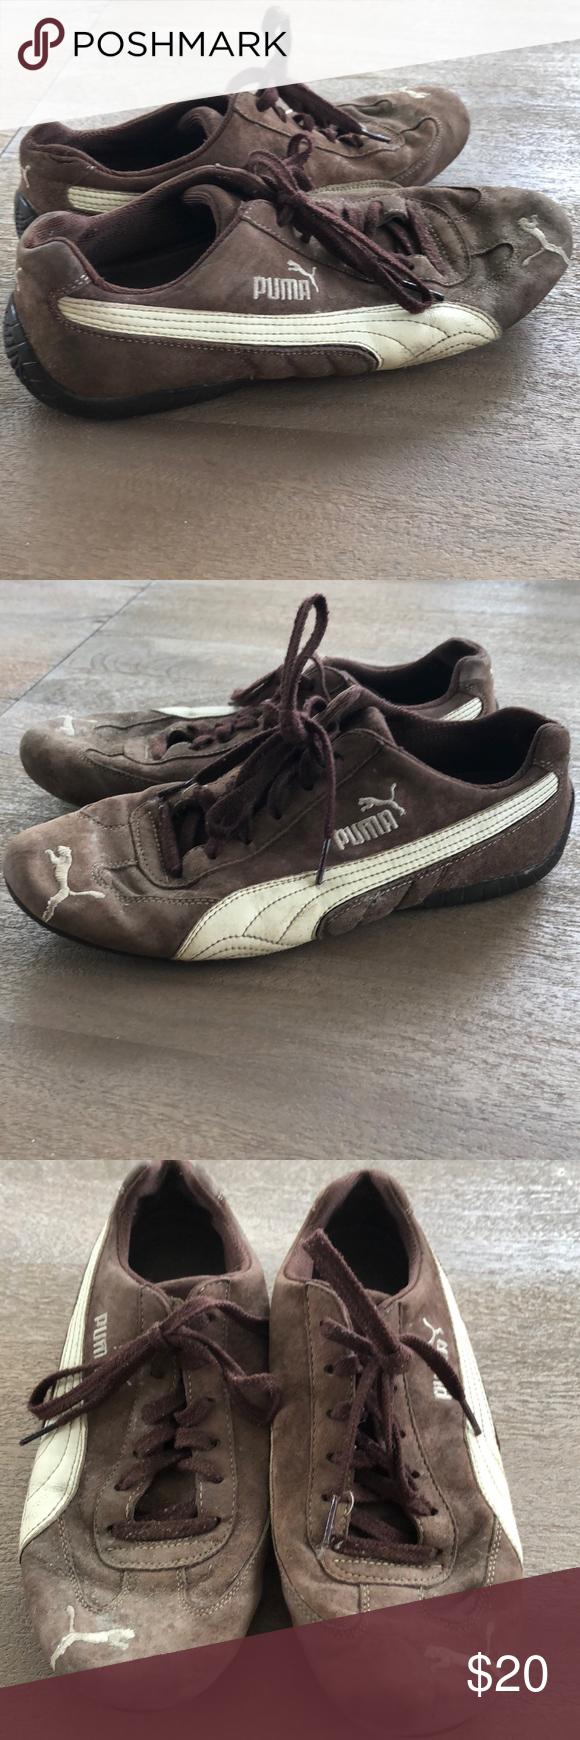 puma shoes 90s - 50% OFF